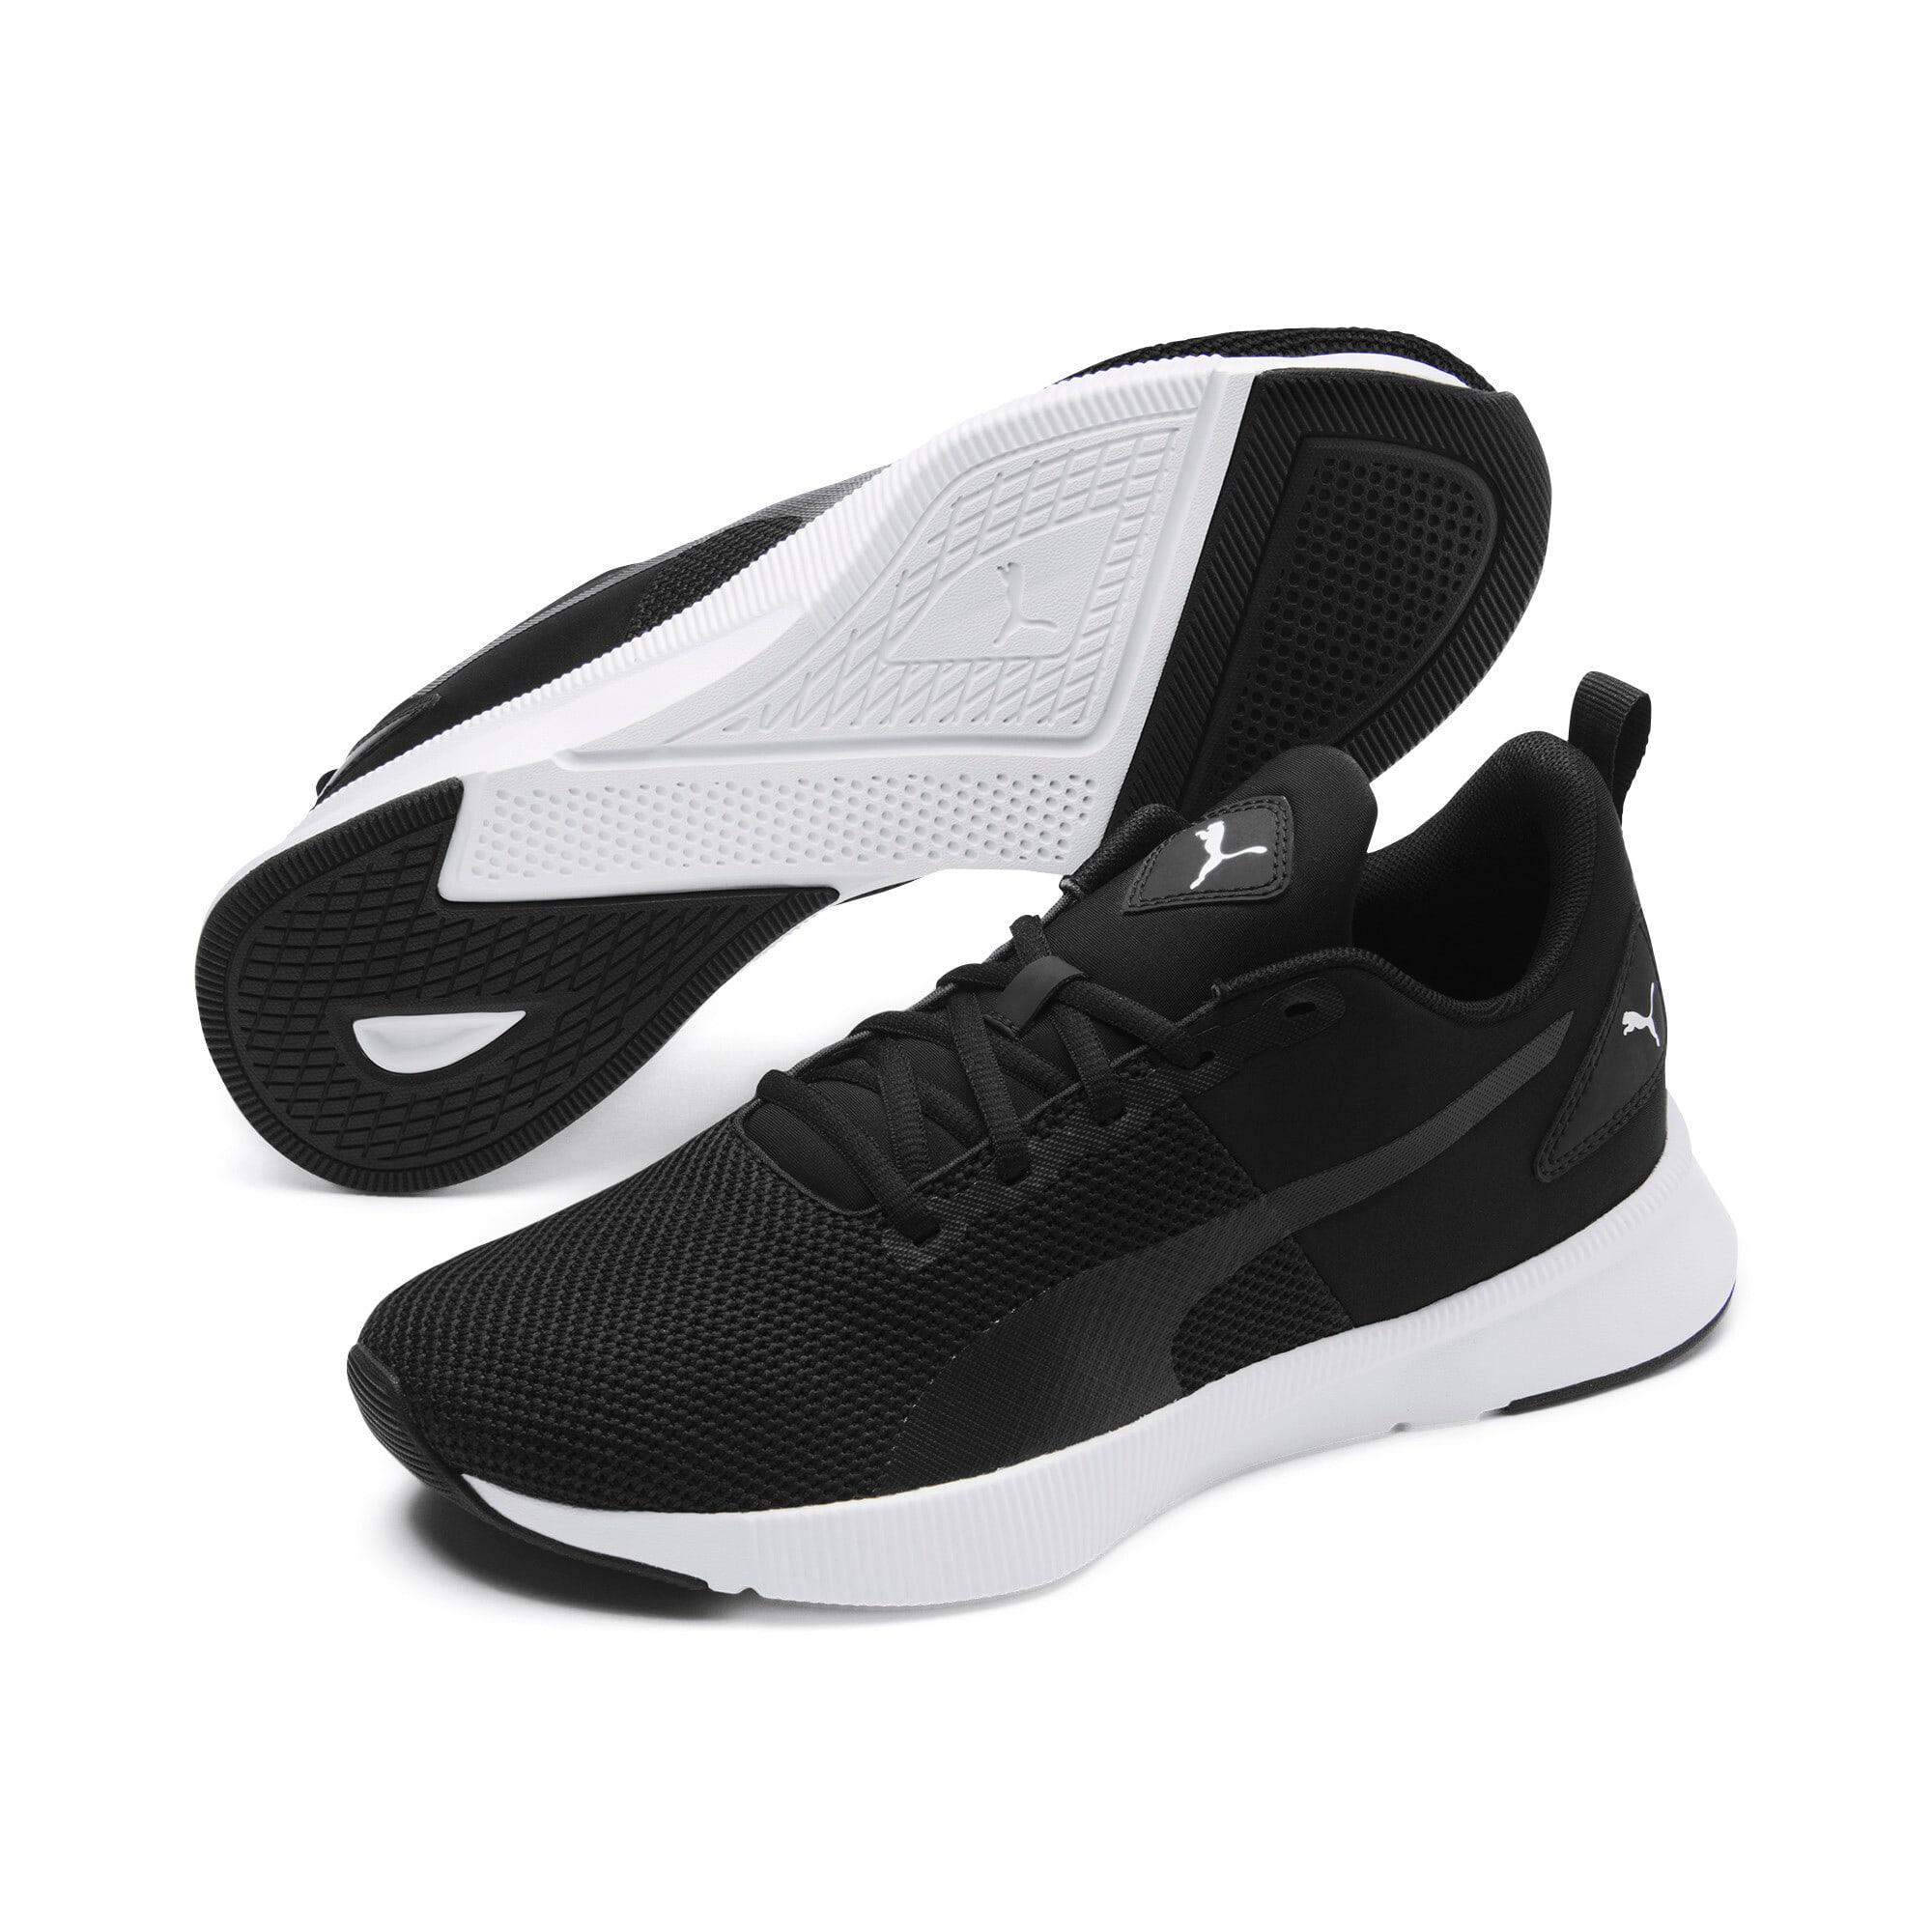 Thumbnail 2 of Flyer Running Shoes, Black-Black-White, medium-IND